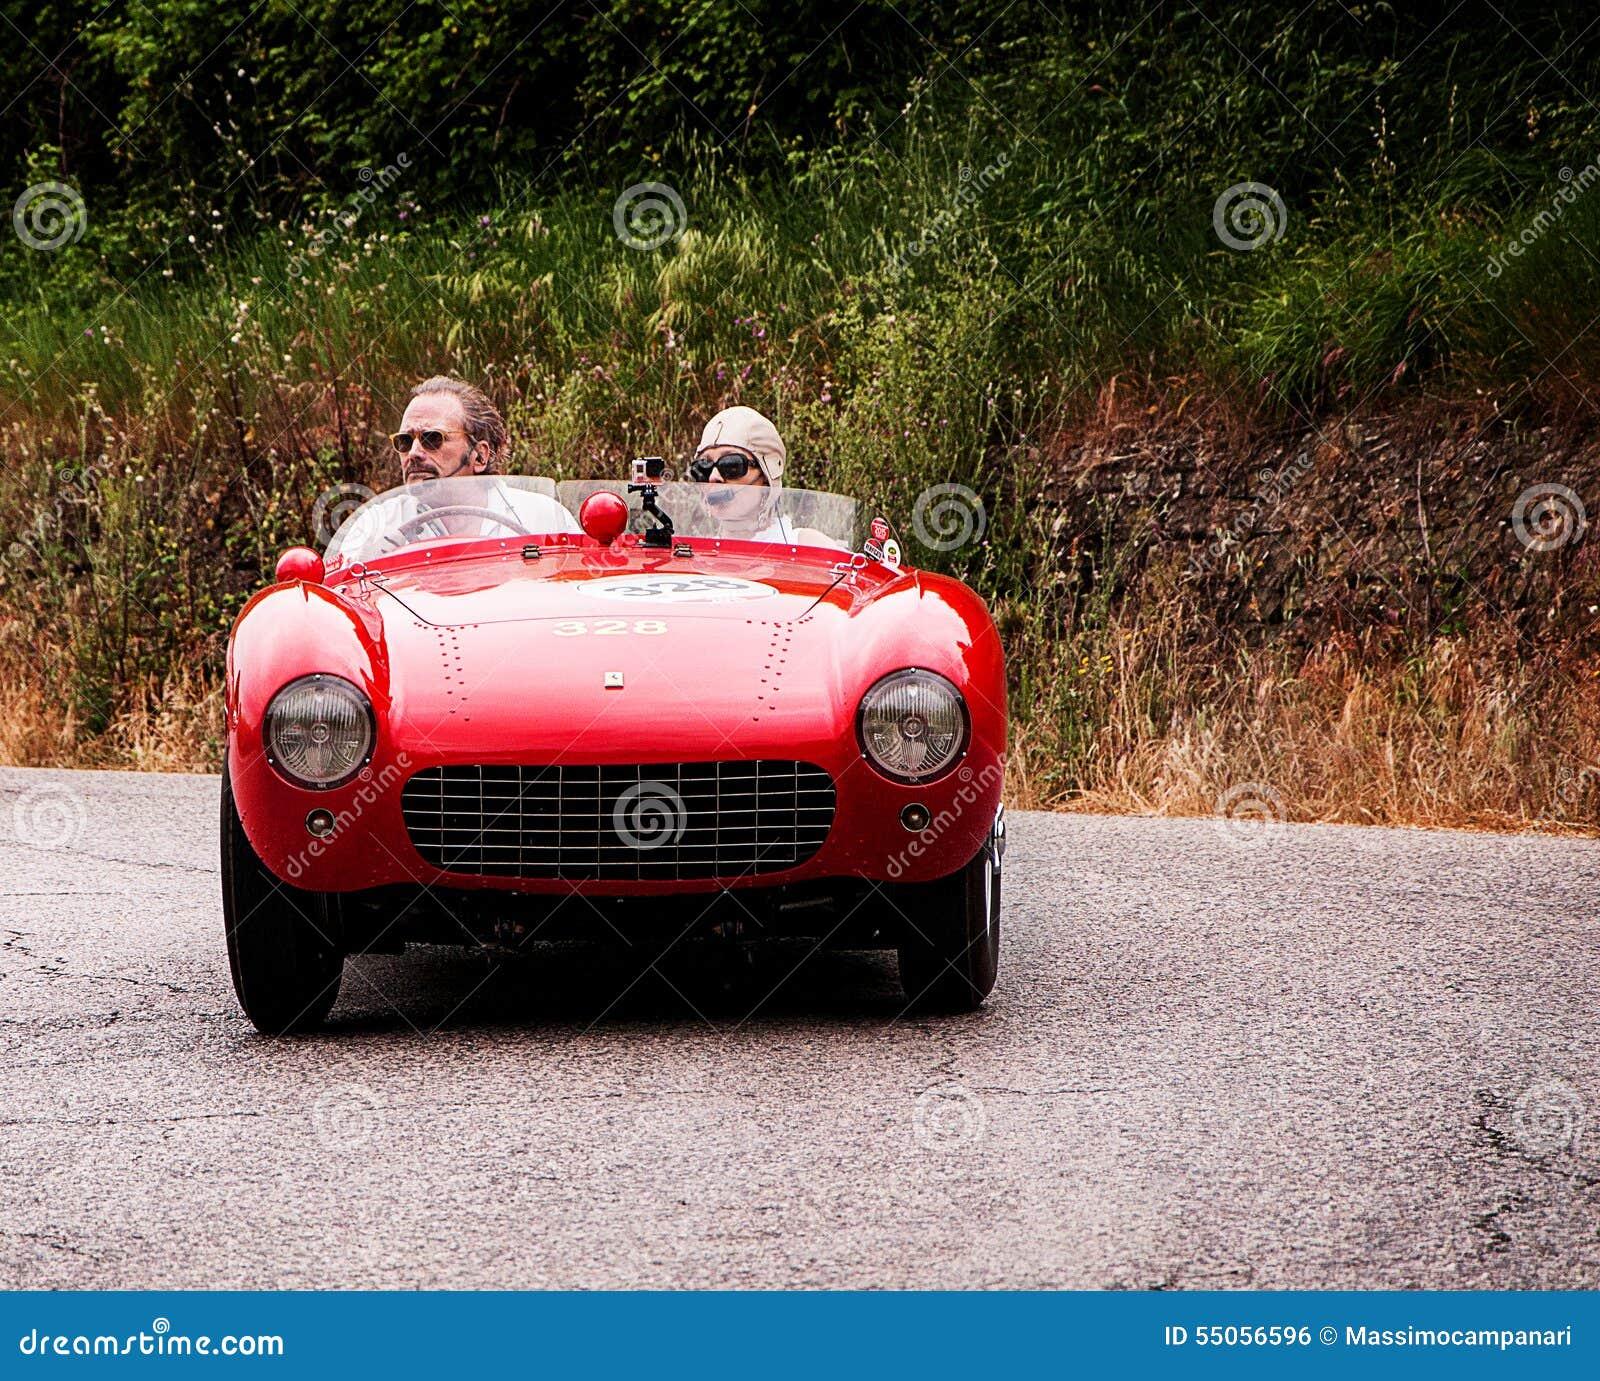 Vintage Fiat 500 Spider Cabrio Special Stock Photography